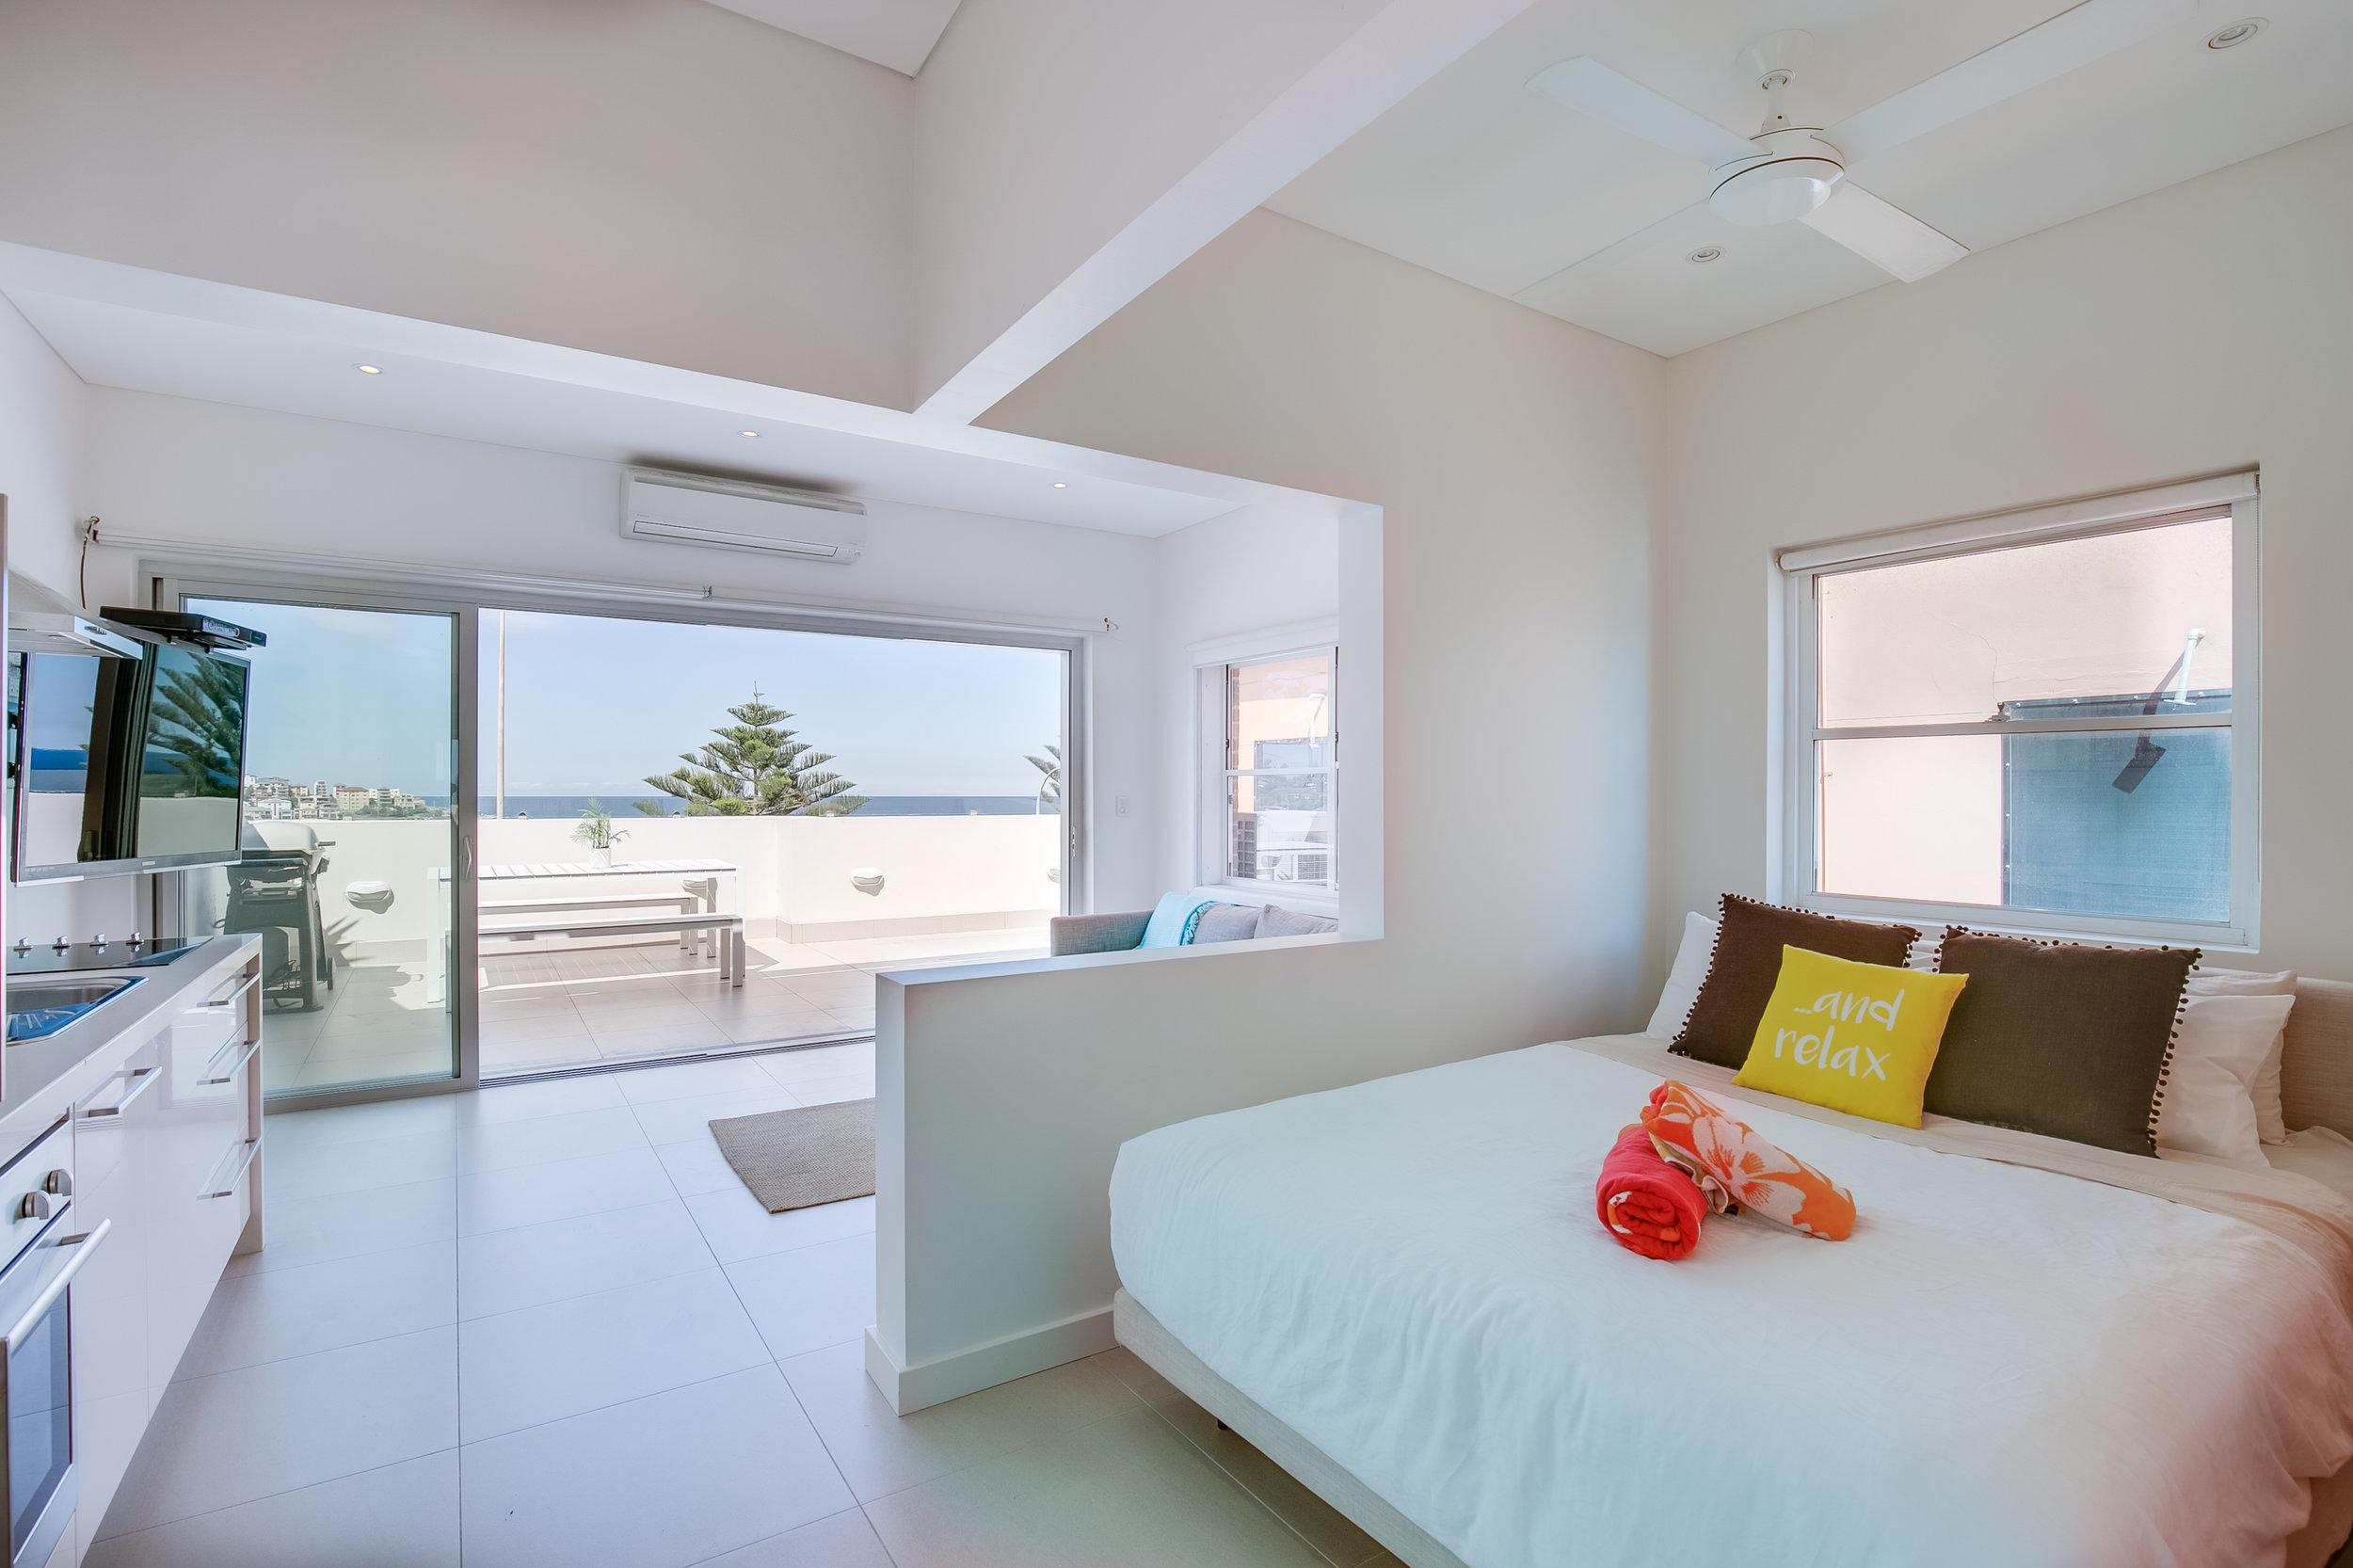 Bondi Beachfront Ocean View Apartment. Bondi Beach Holiday Homes 1.jpg